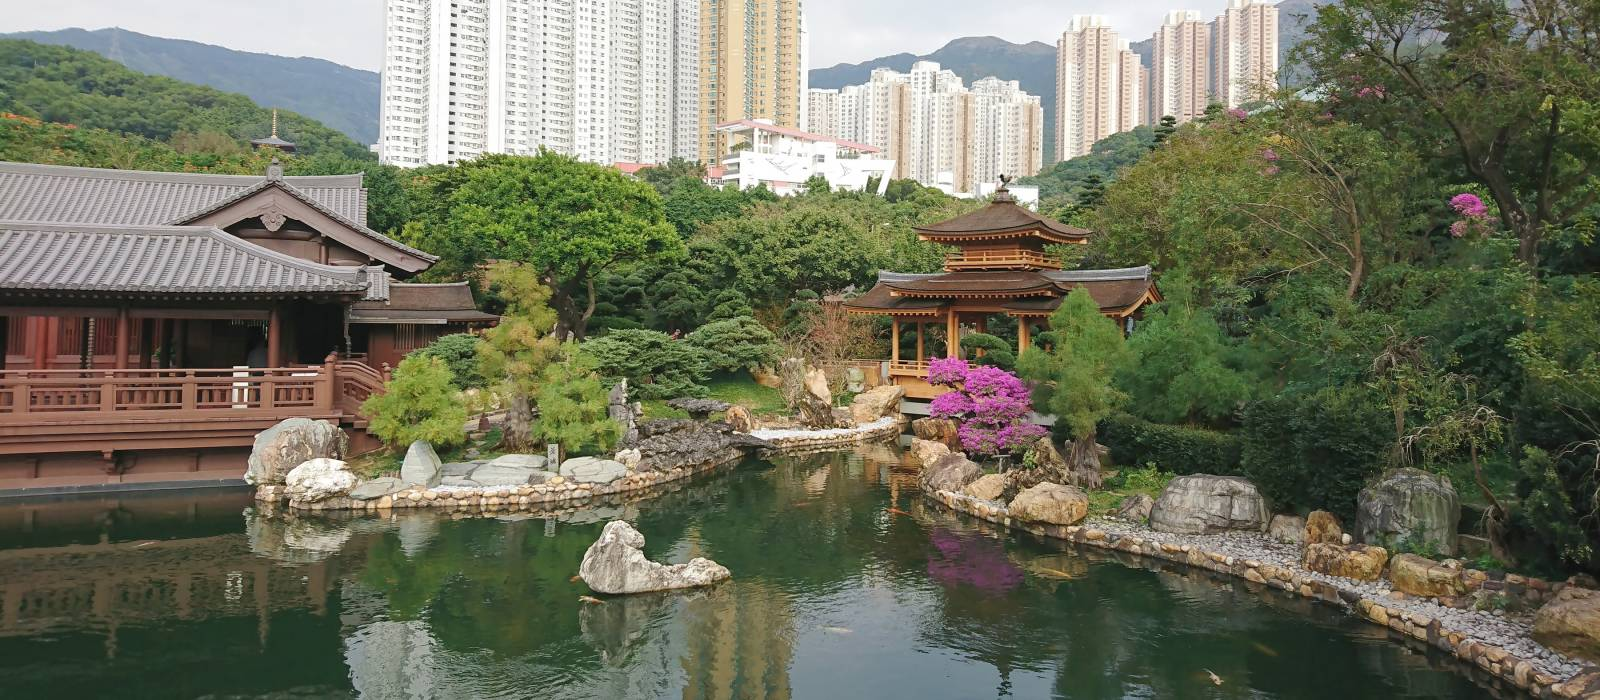 Nan Lian Garden at Kowloon Hong Kong, Asia